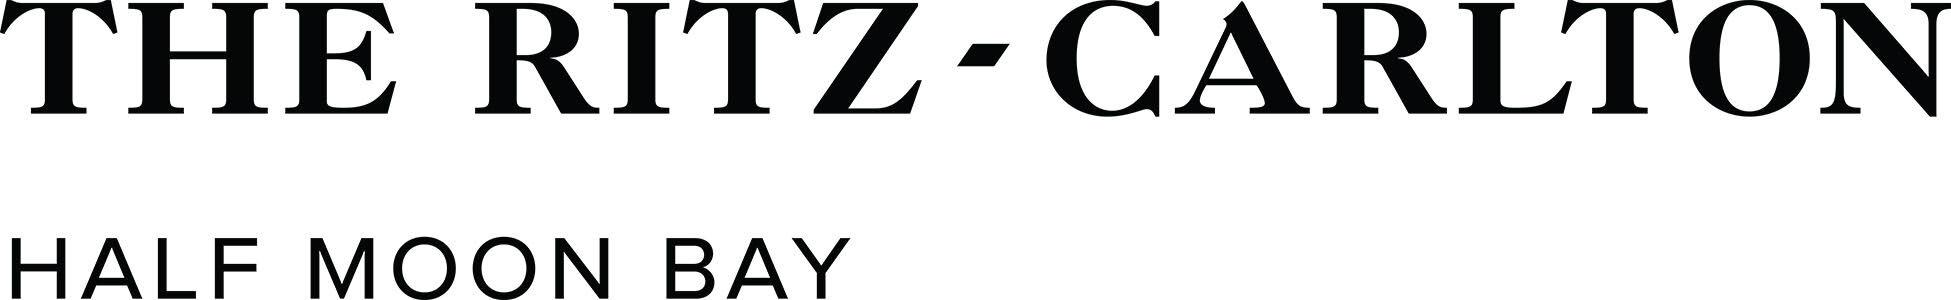 Ritz-Carlton.jpg